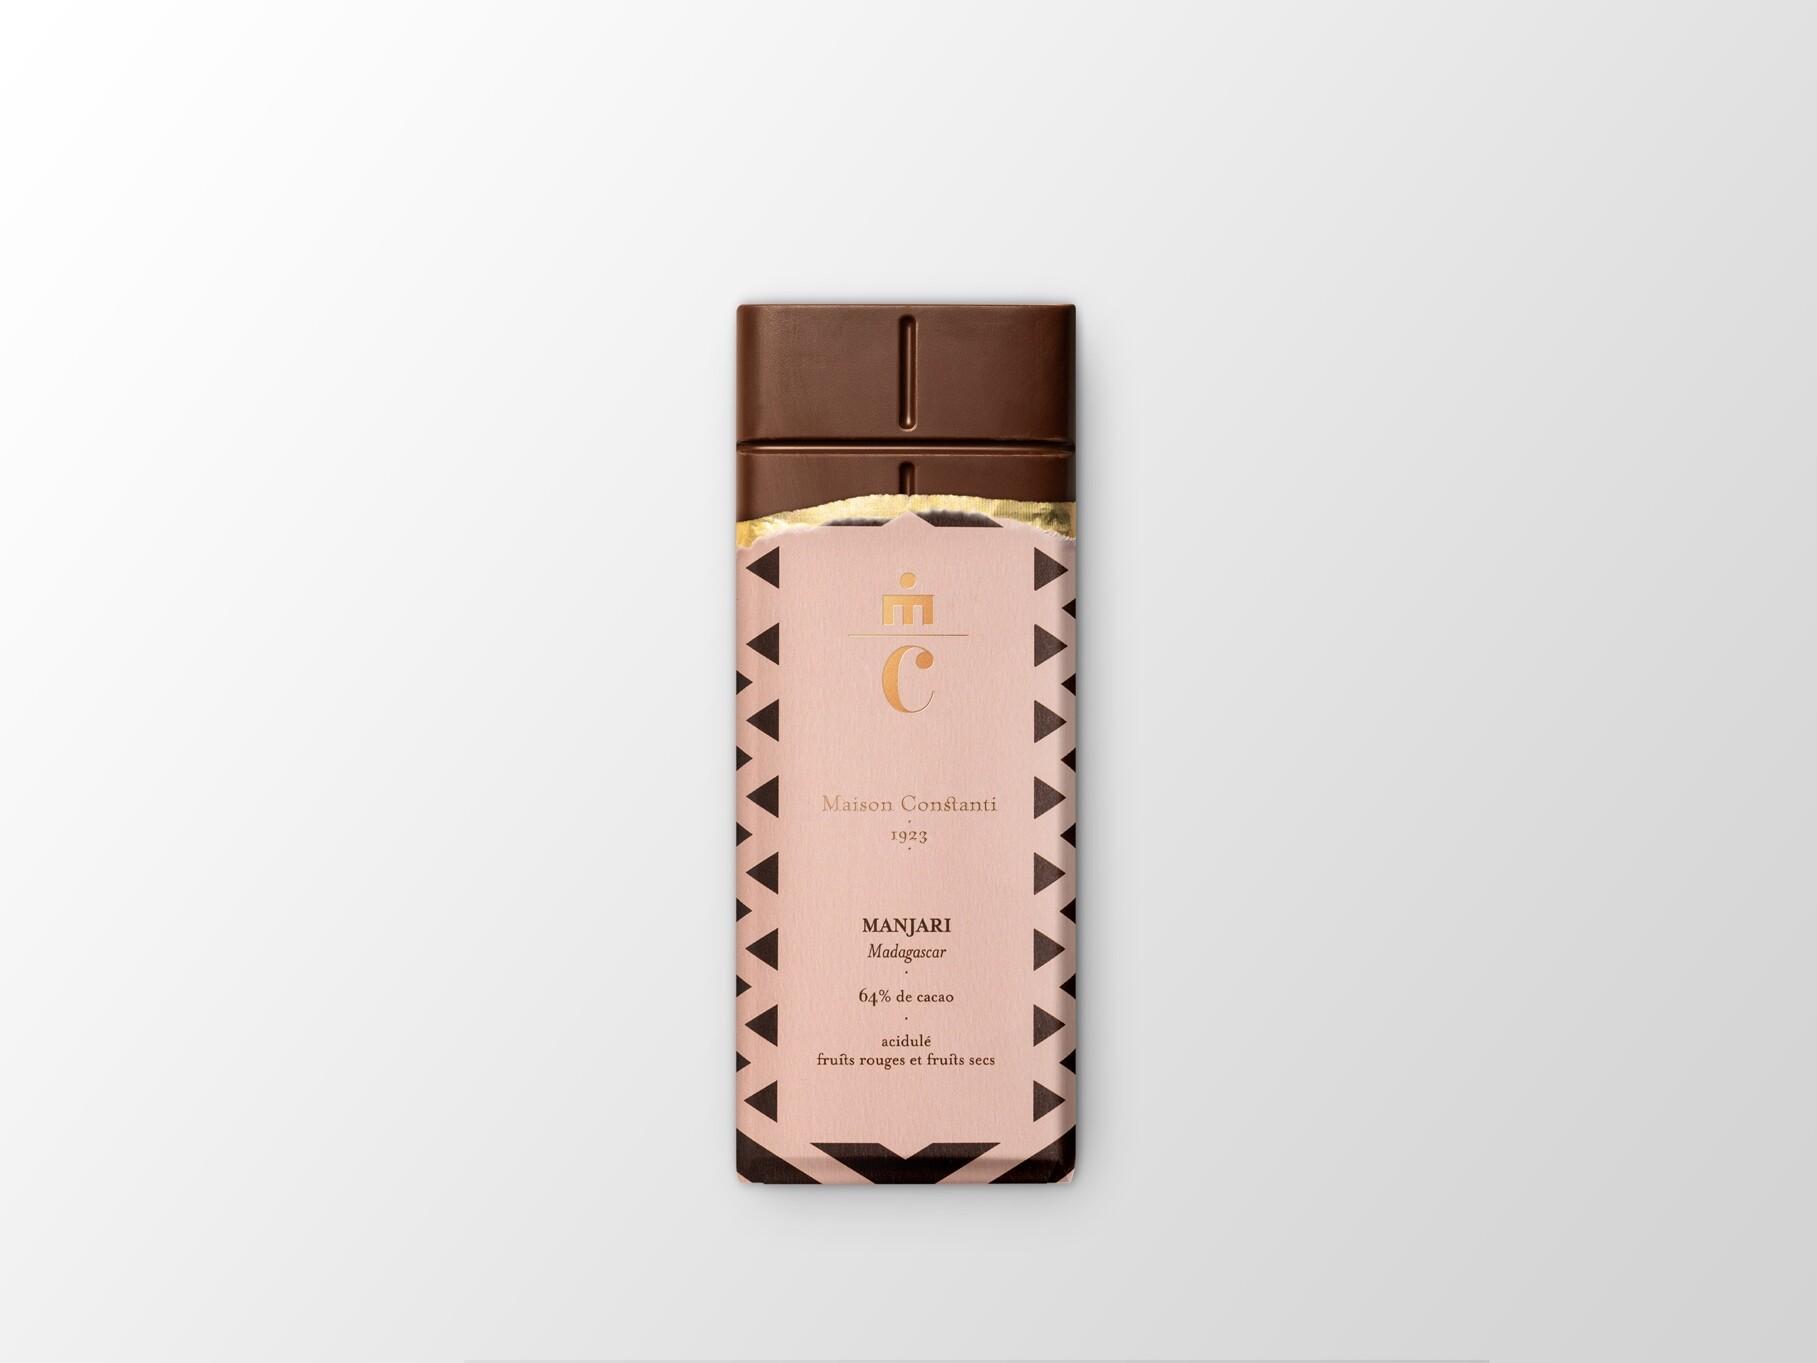 Tablette de chocolat Manjari de Constanti